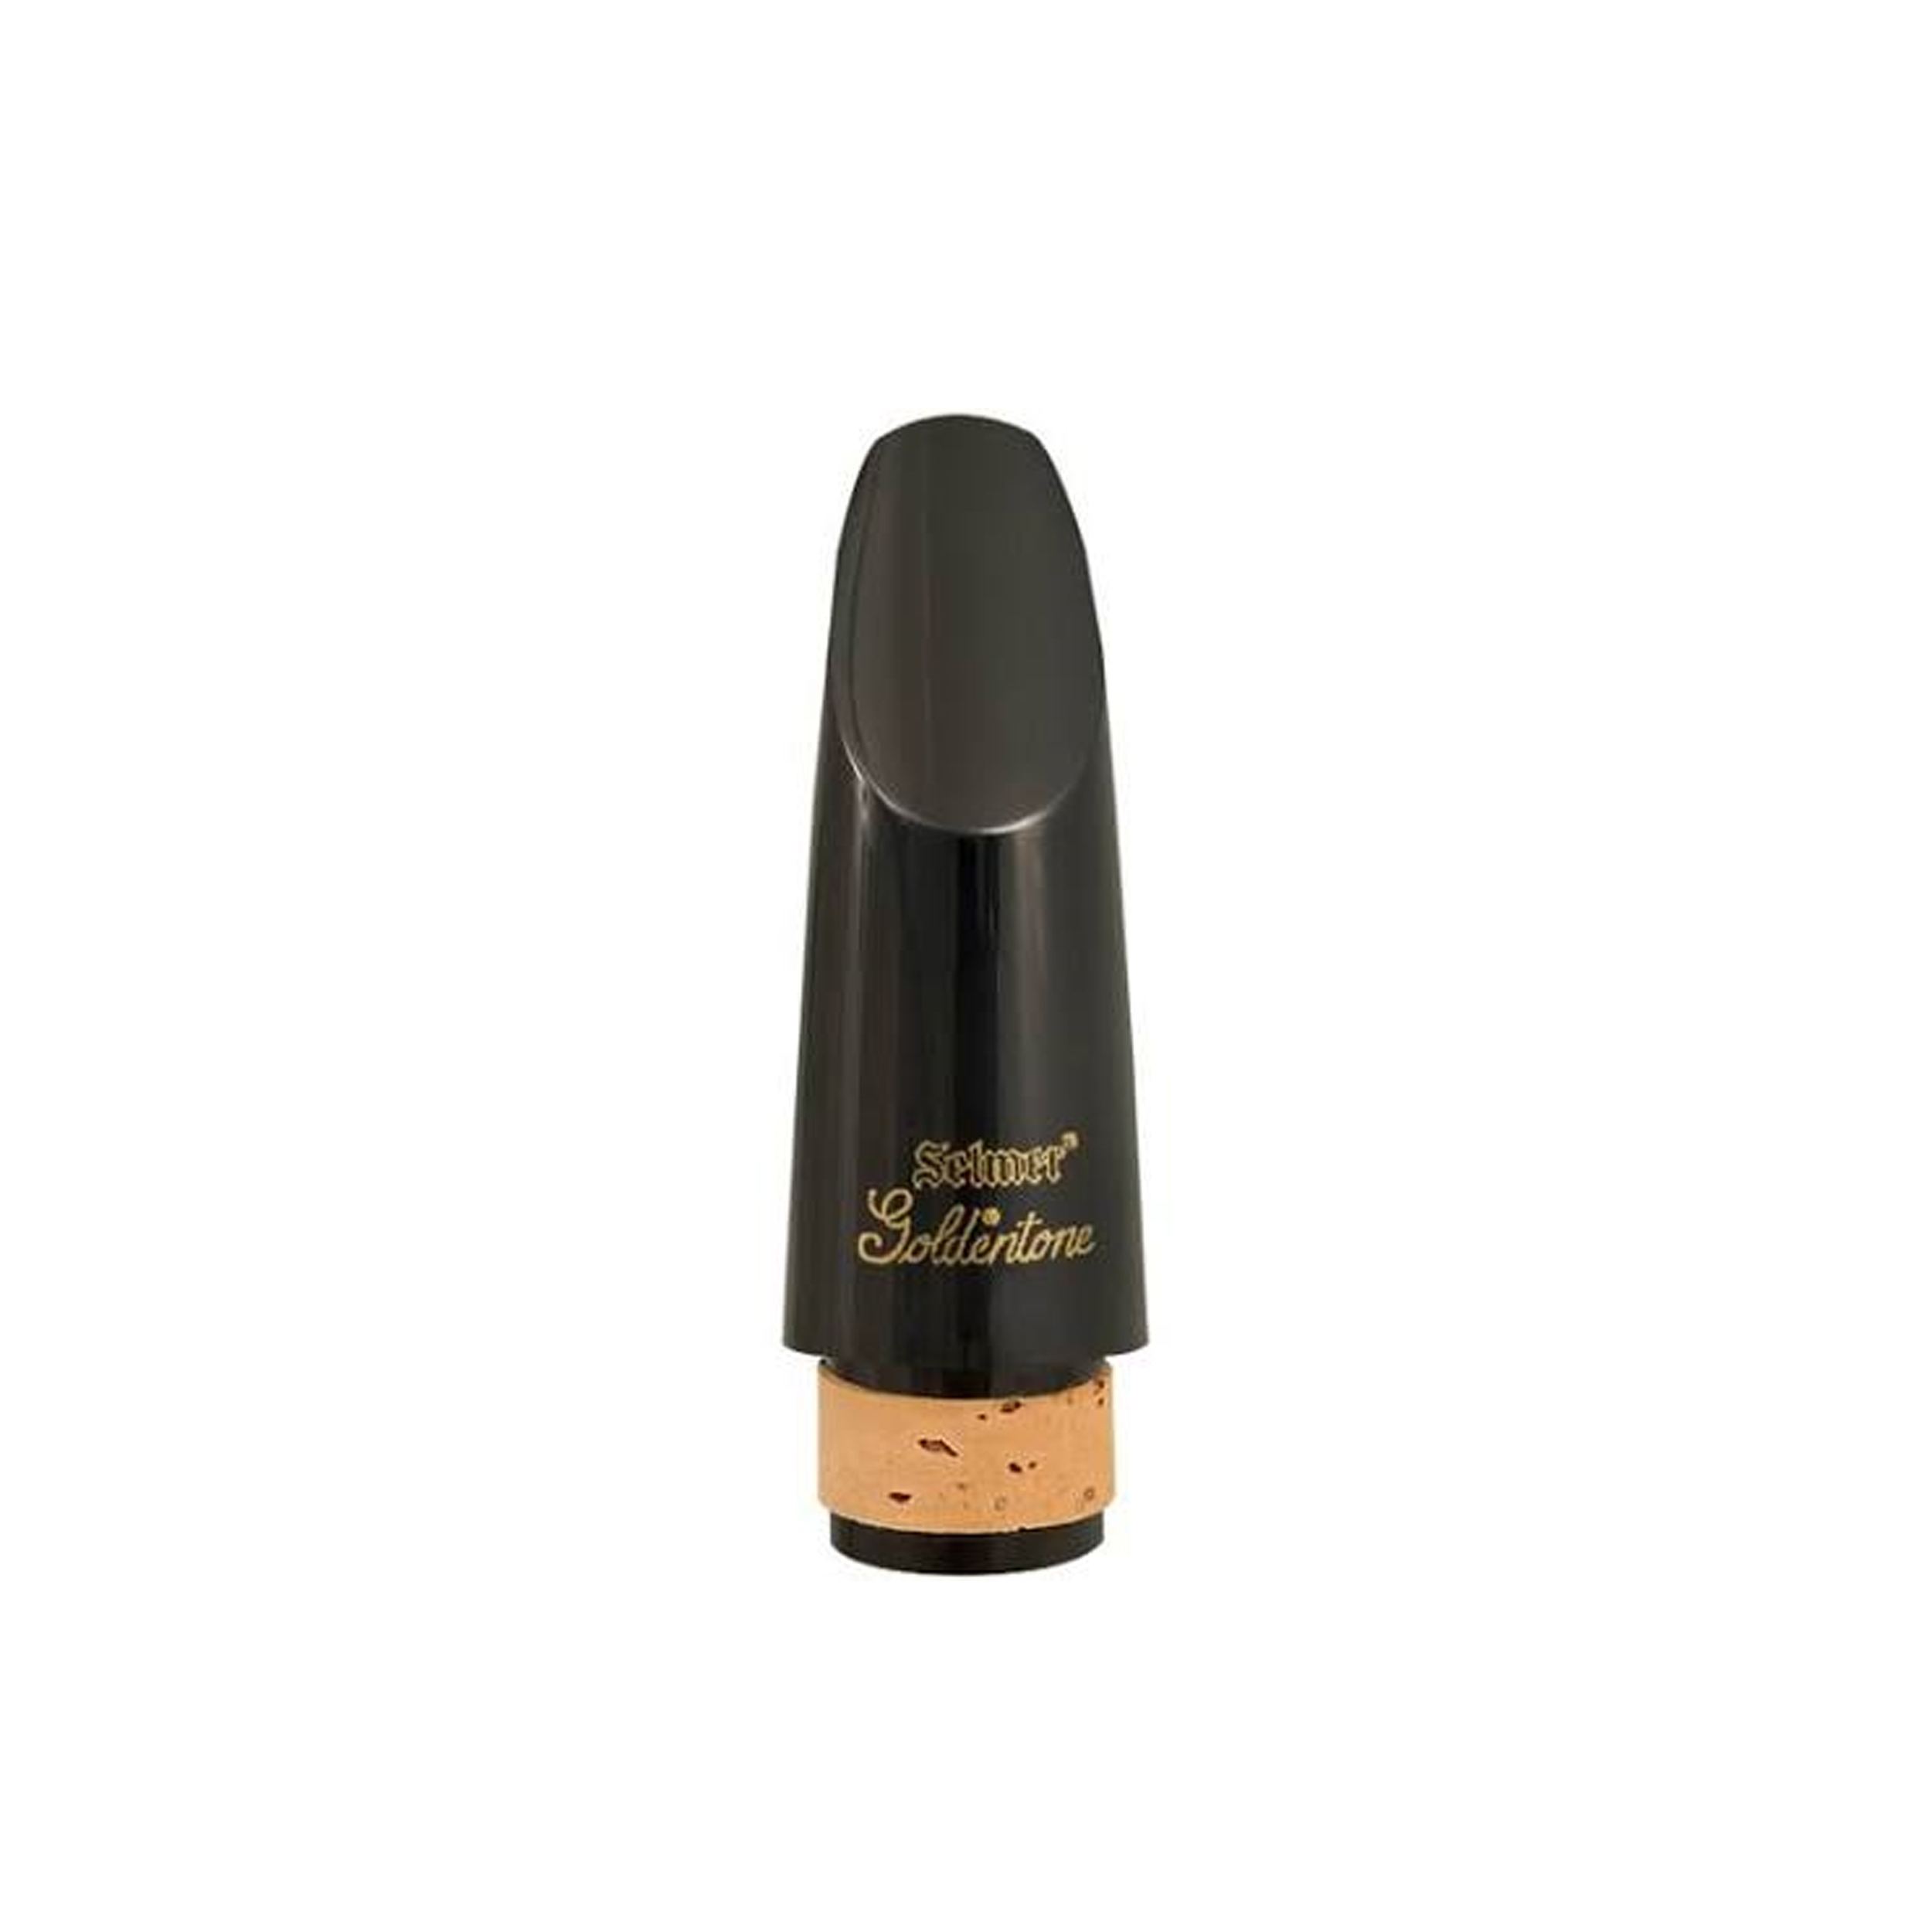 Selmer 77113 Goldentone Clarinet Mouthpiece #3